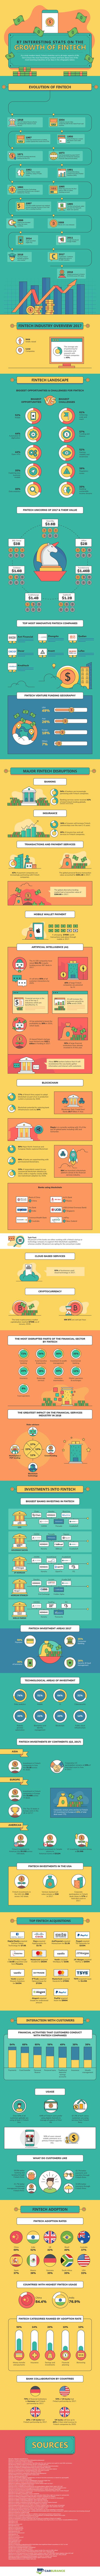 infographic-growth-fintech-updated-23jan